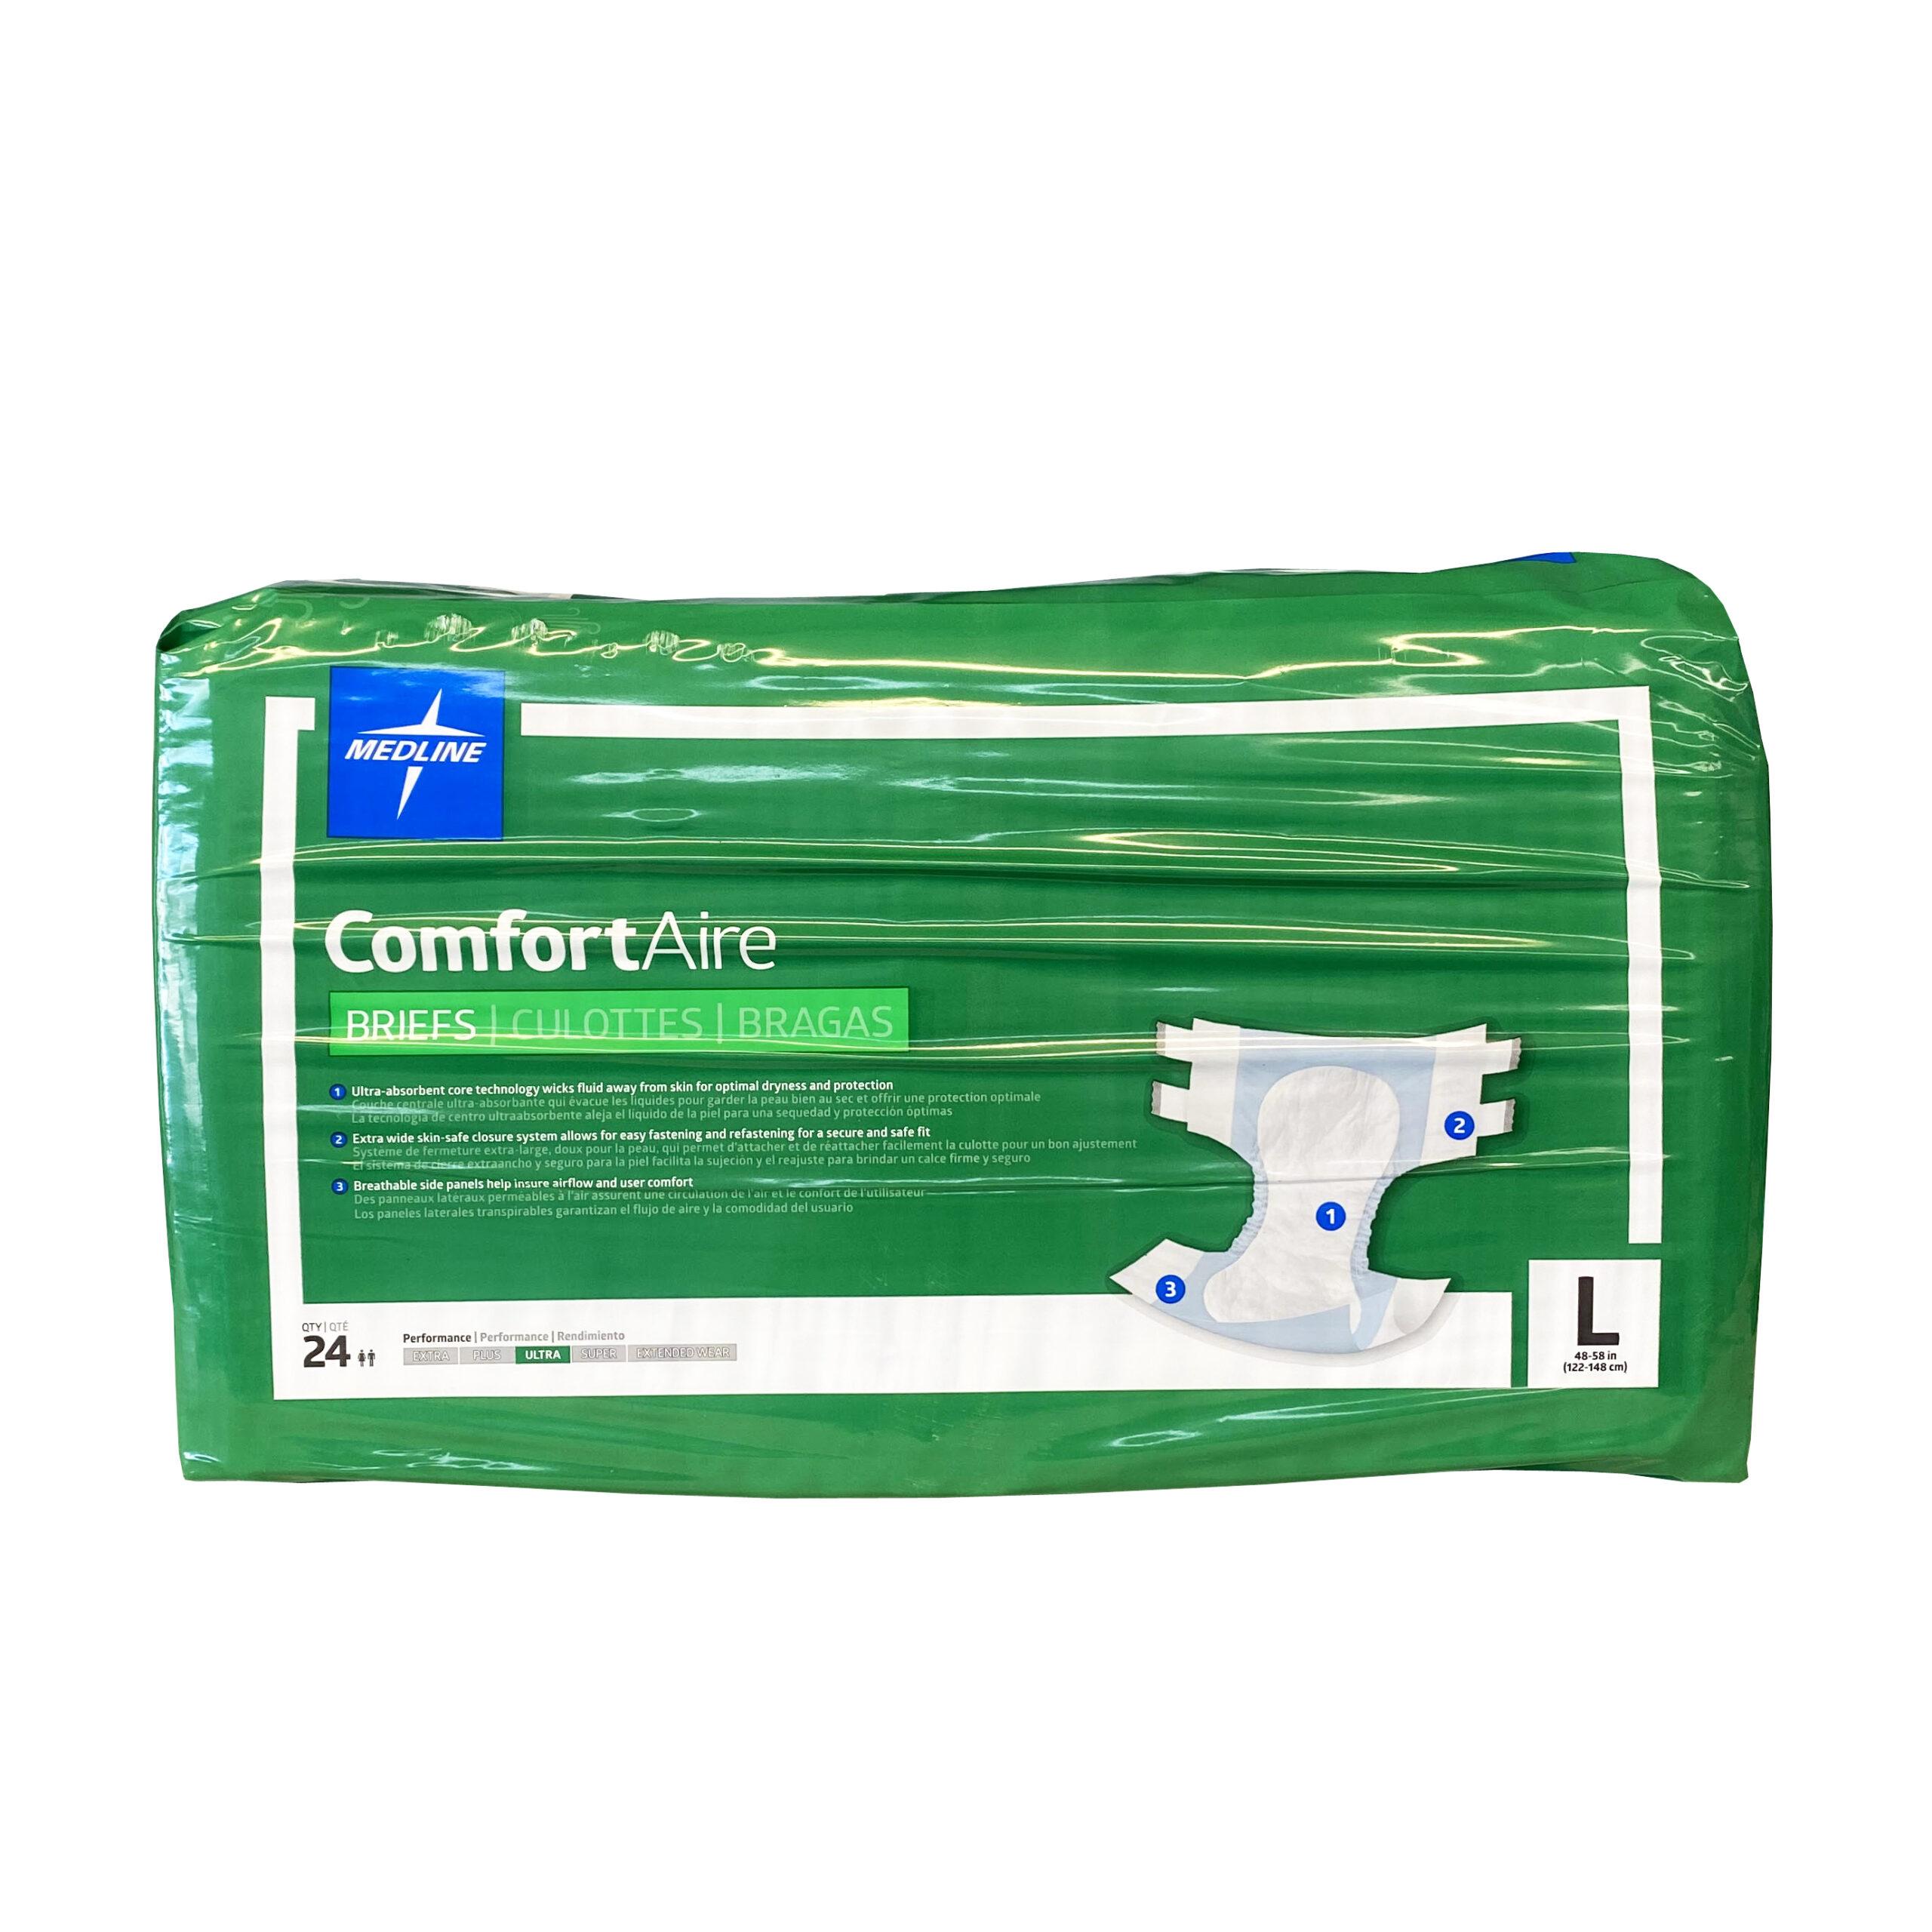 Medline Comfort-Aire Adult Briefs